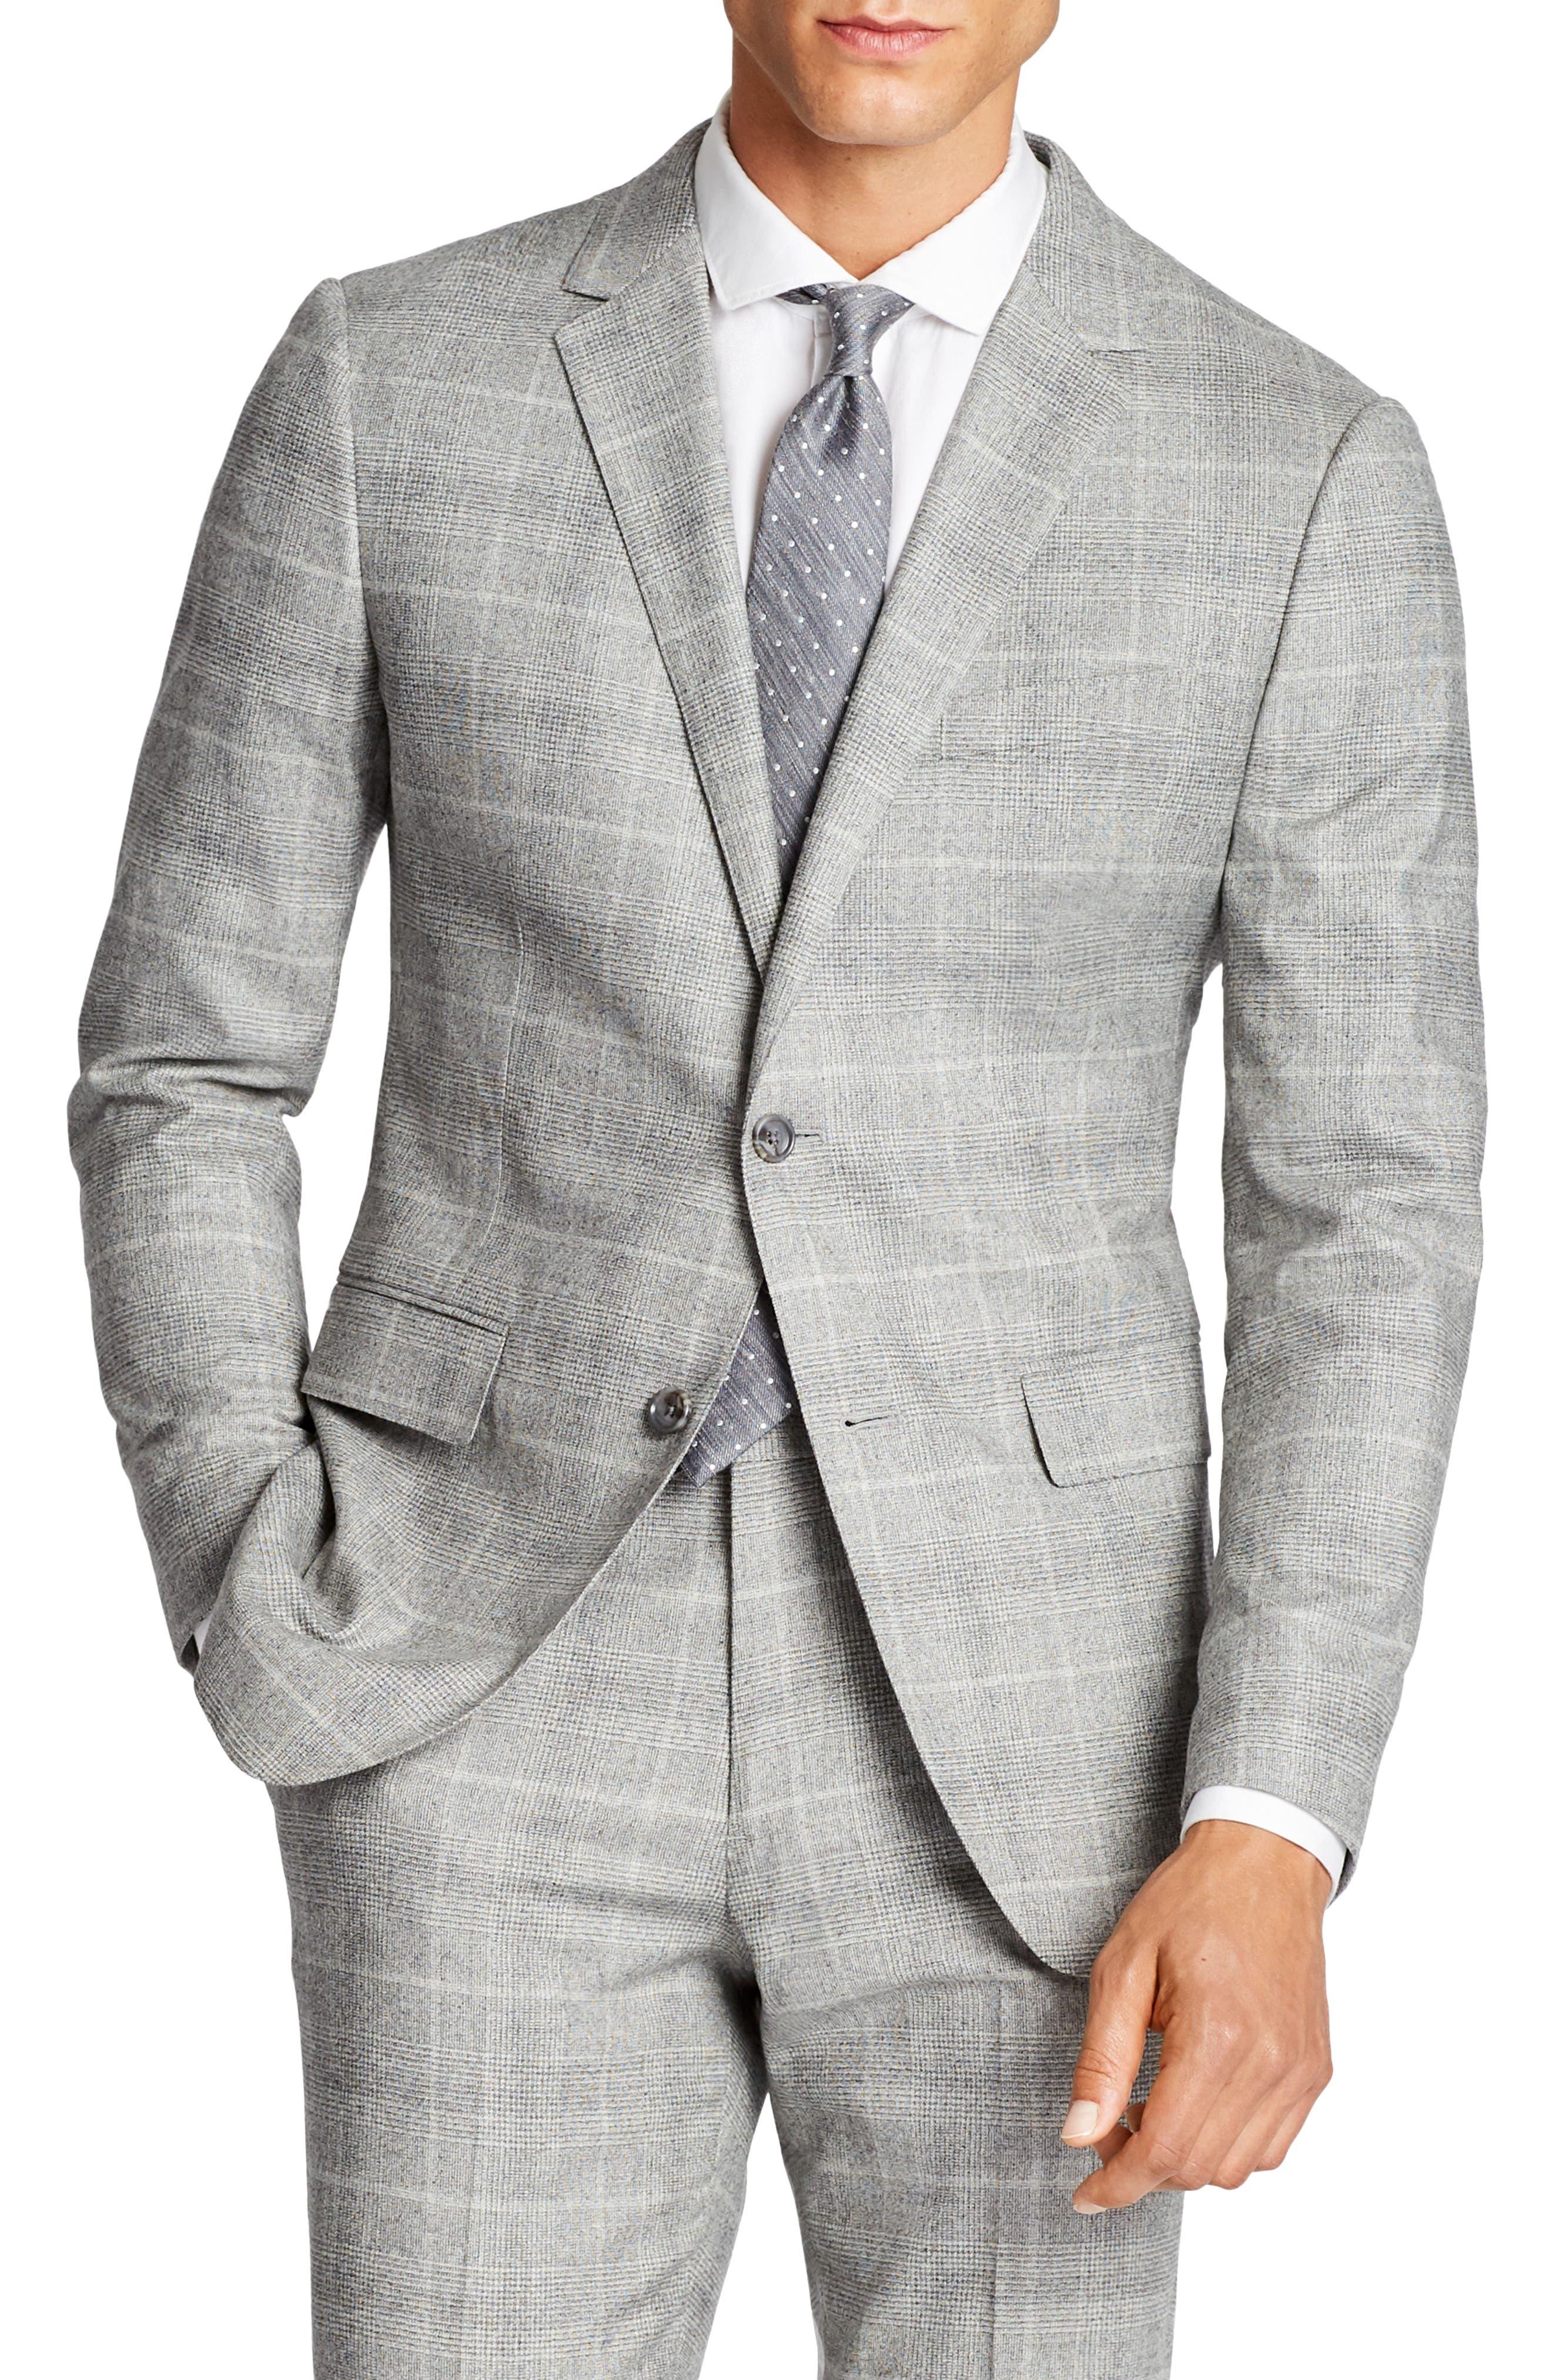 Jetsetter Slim Fit Plaid Stretch Wool Sport Coat,                             Main thumbnail 1, color,                             Light Grey Flannel